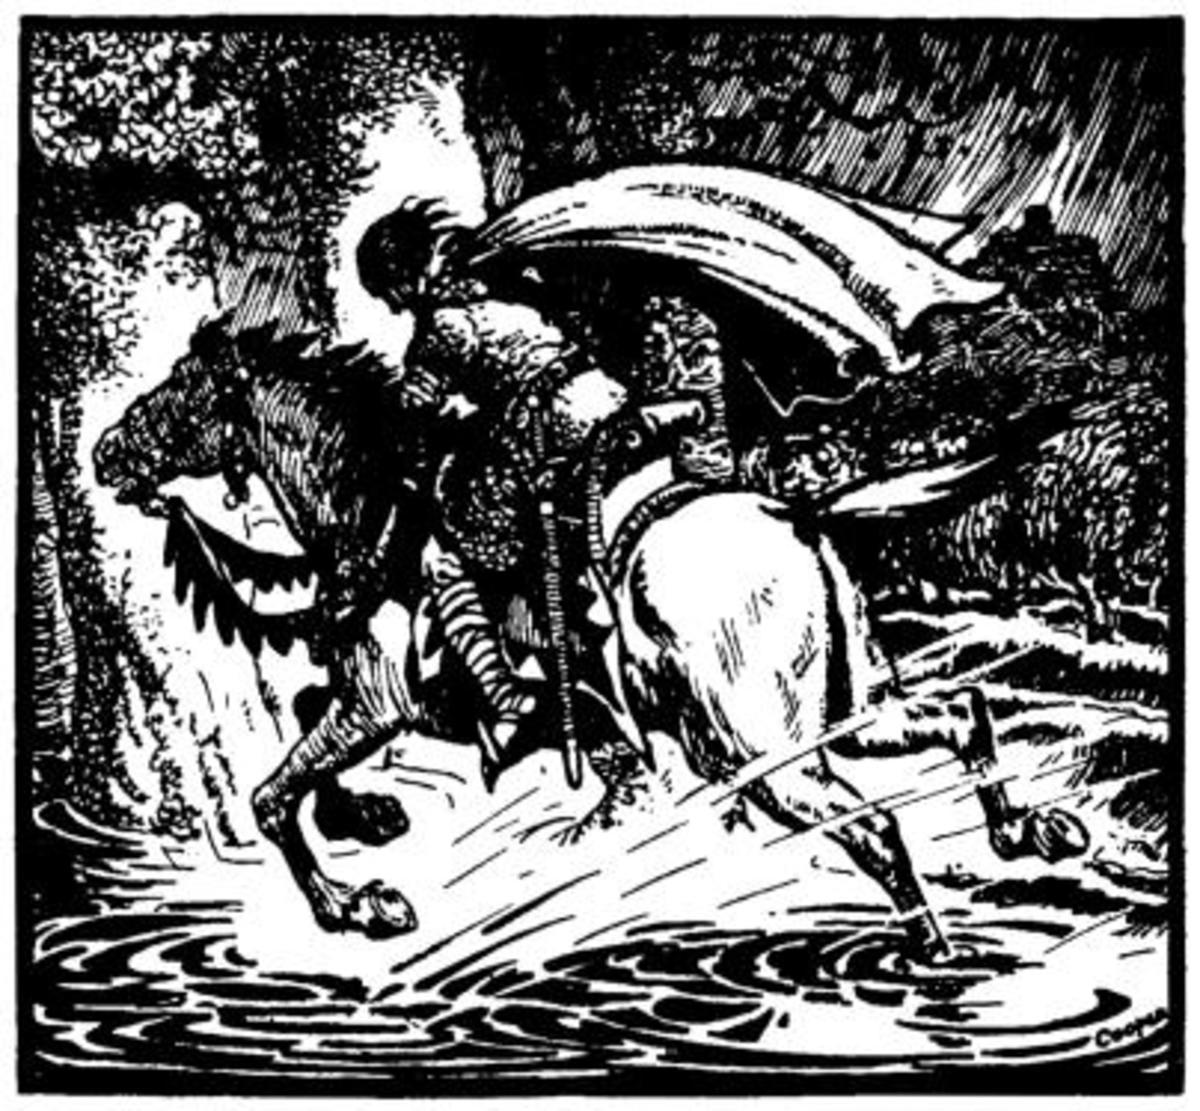 Trevillion flees the Flood